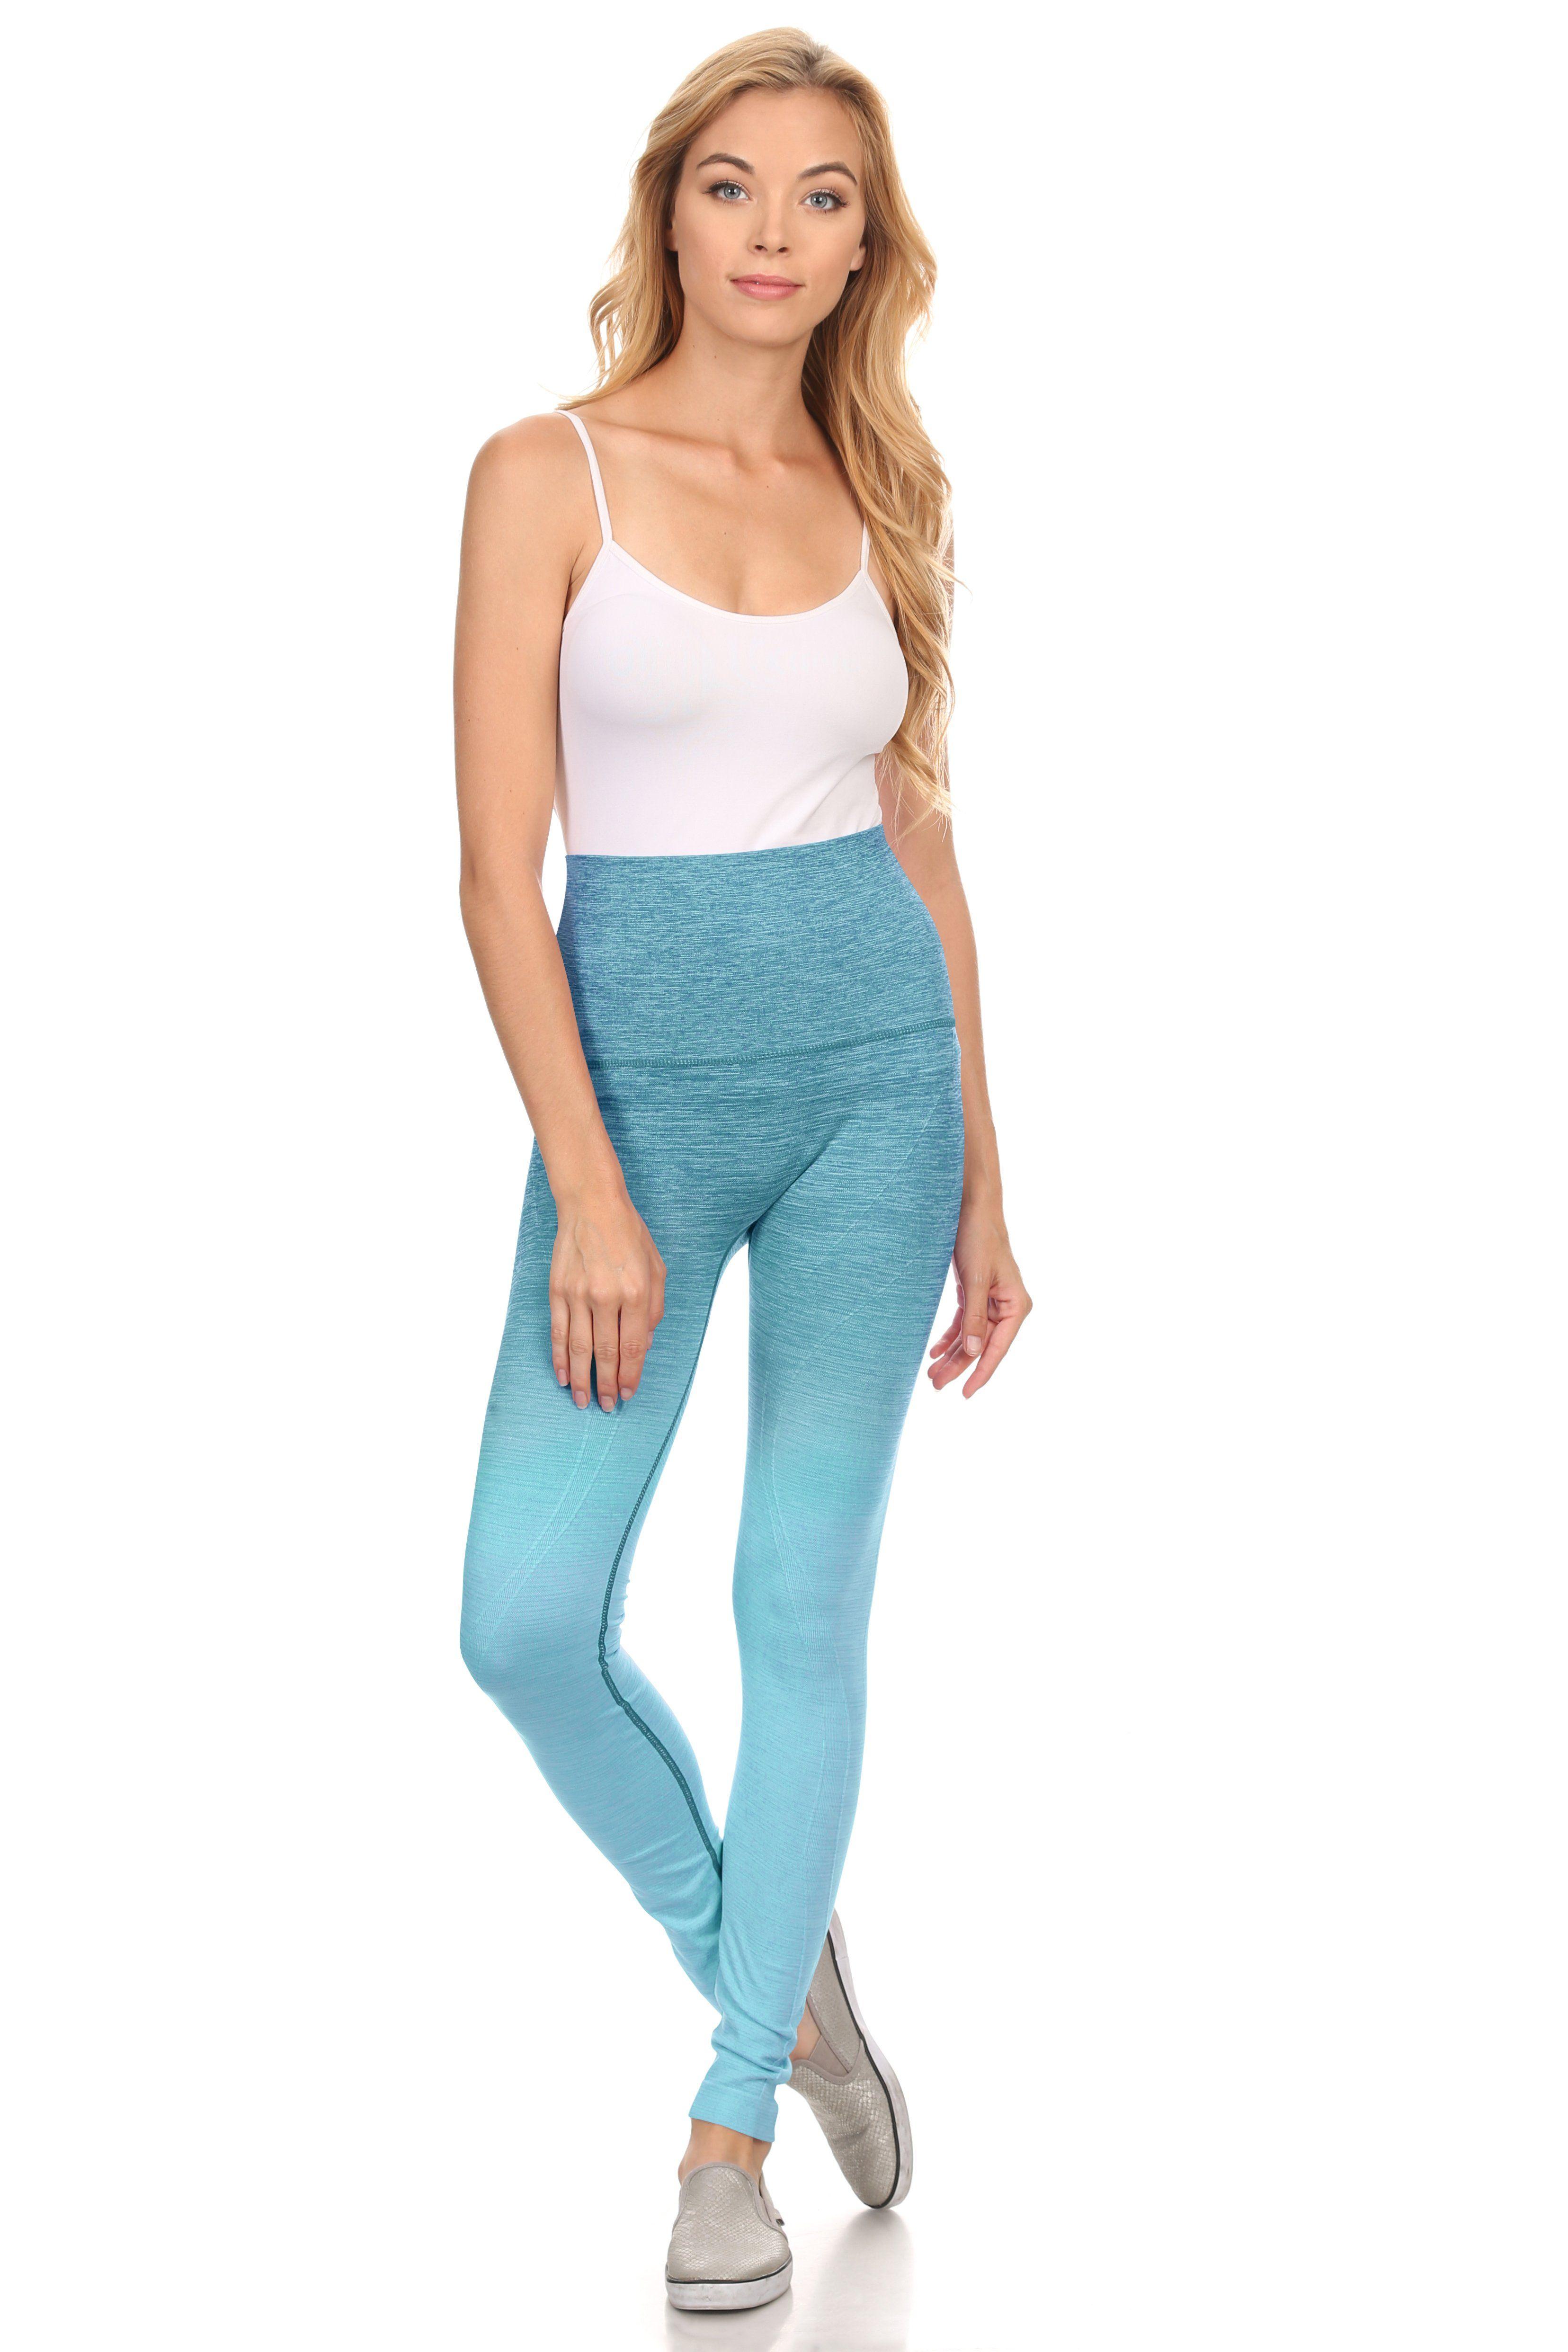 9c2365a6ffd5d Simlu Running Workout Leggings Fold Over Pants Yoga Pants Leggings for Women